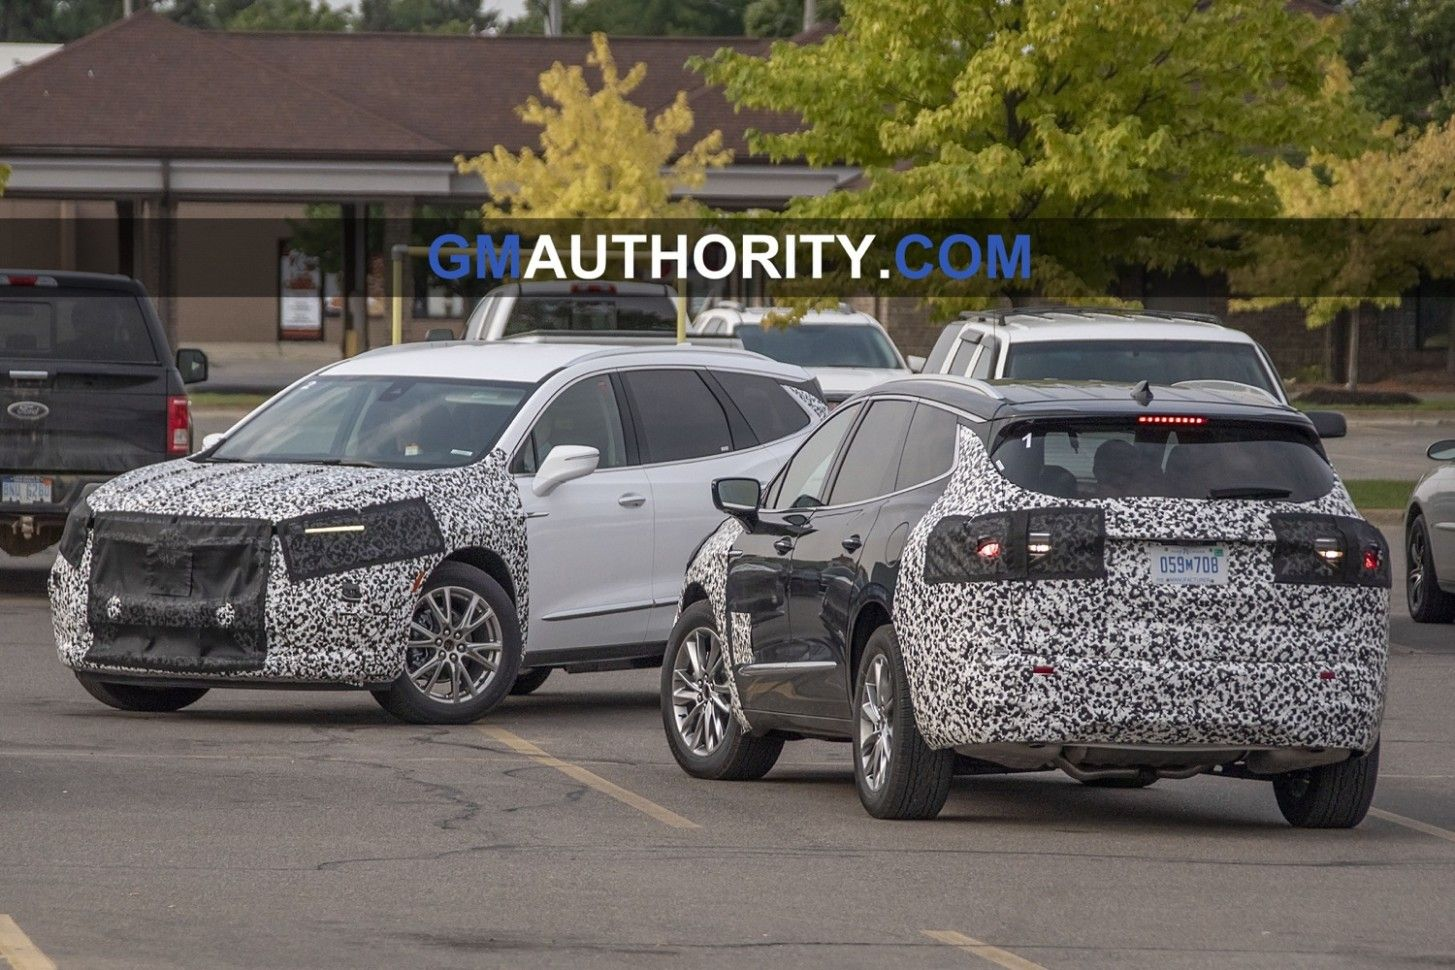 2021 Buick Enclave Spy Photos Model